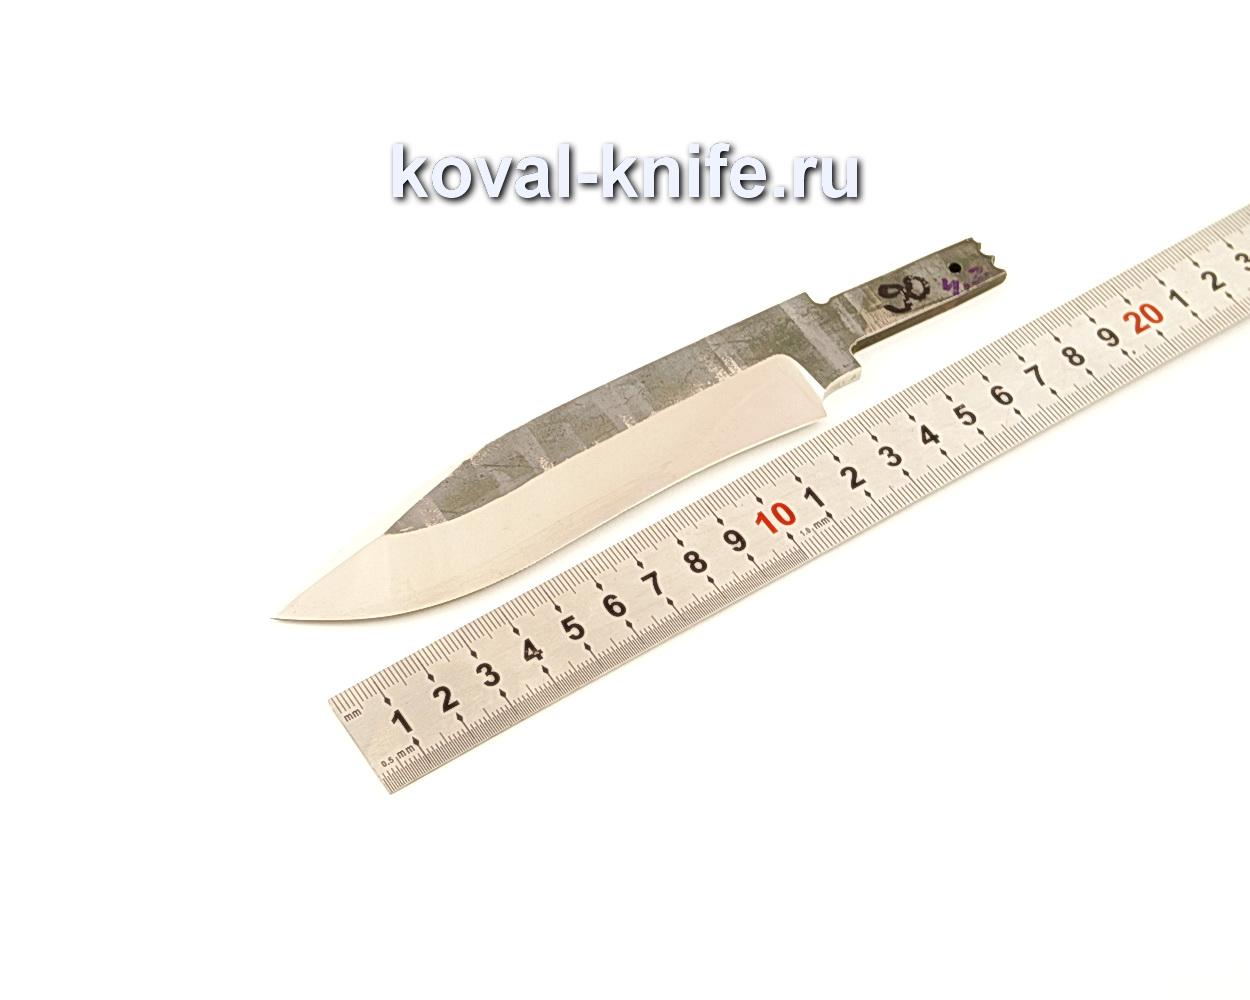 Клинок для ножа из кованой 110Х18 МШД N90